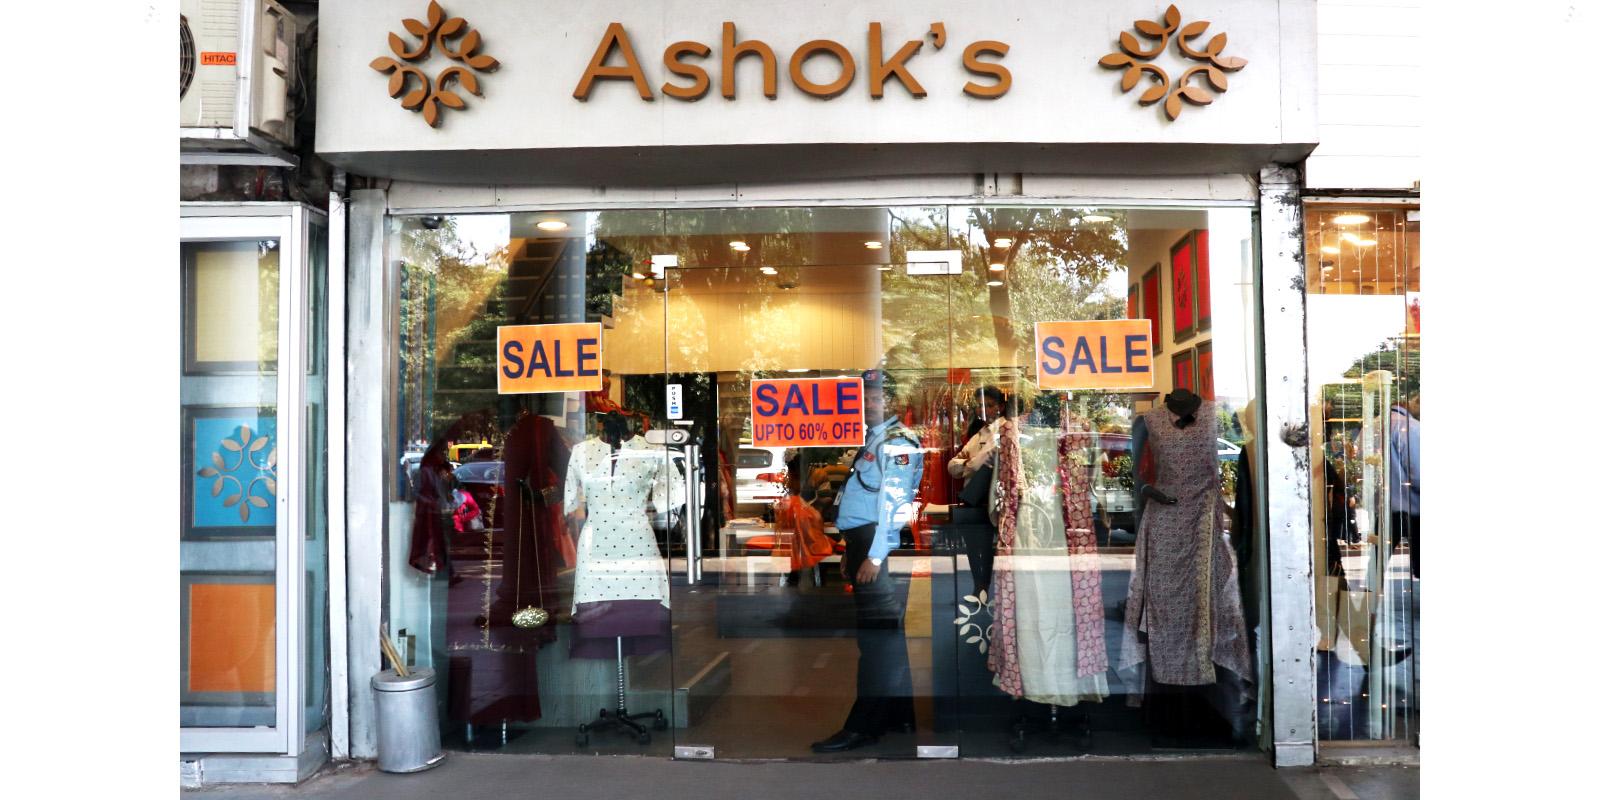 Ashok's